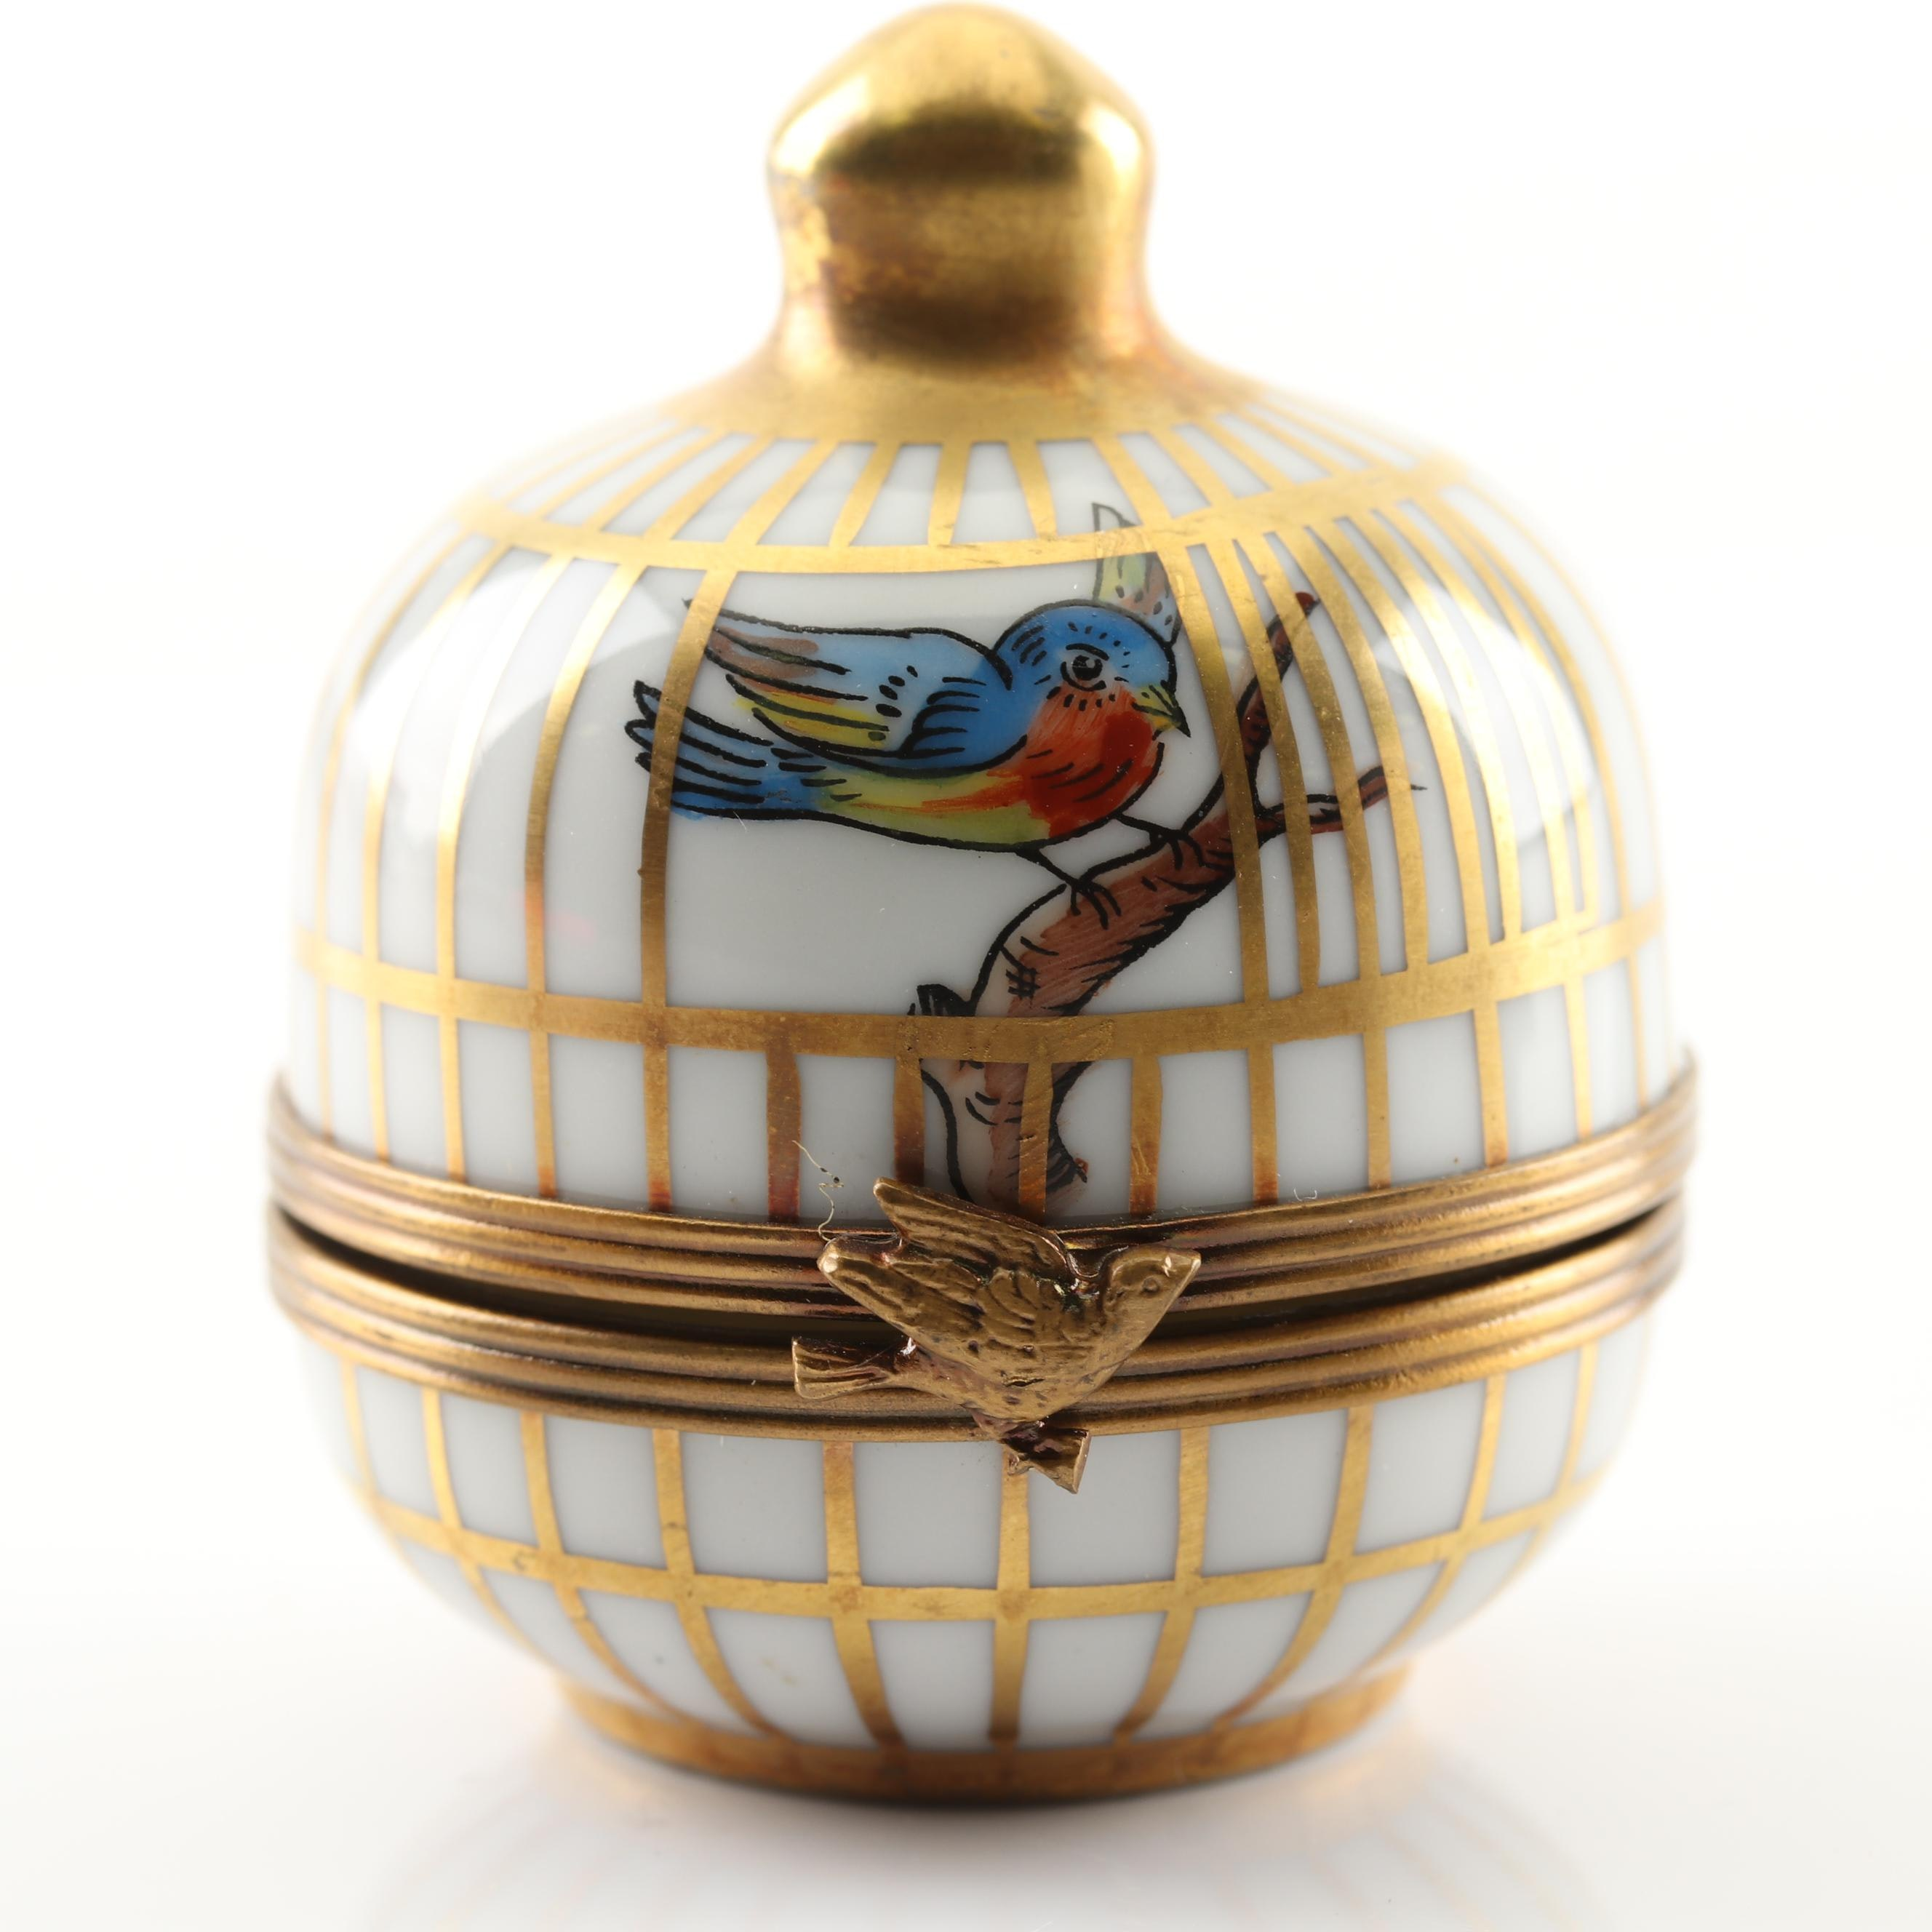 Gerard Ribierre Hand-Painted Limoges Porcelain Birdcage Trinket Box